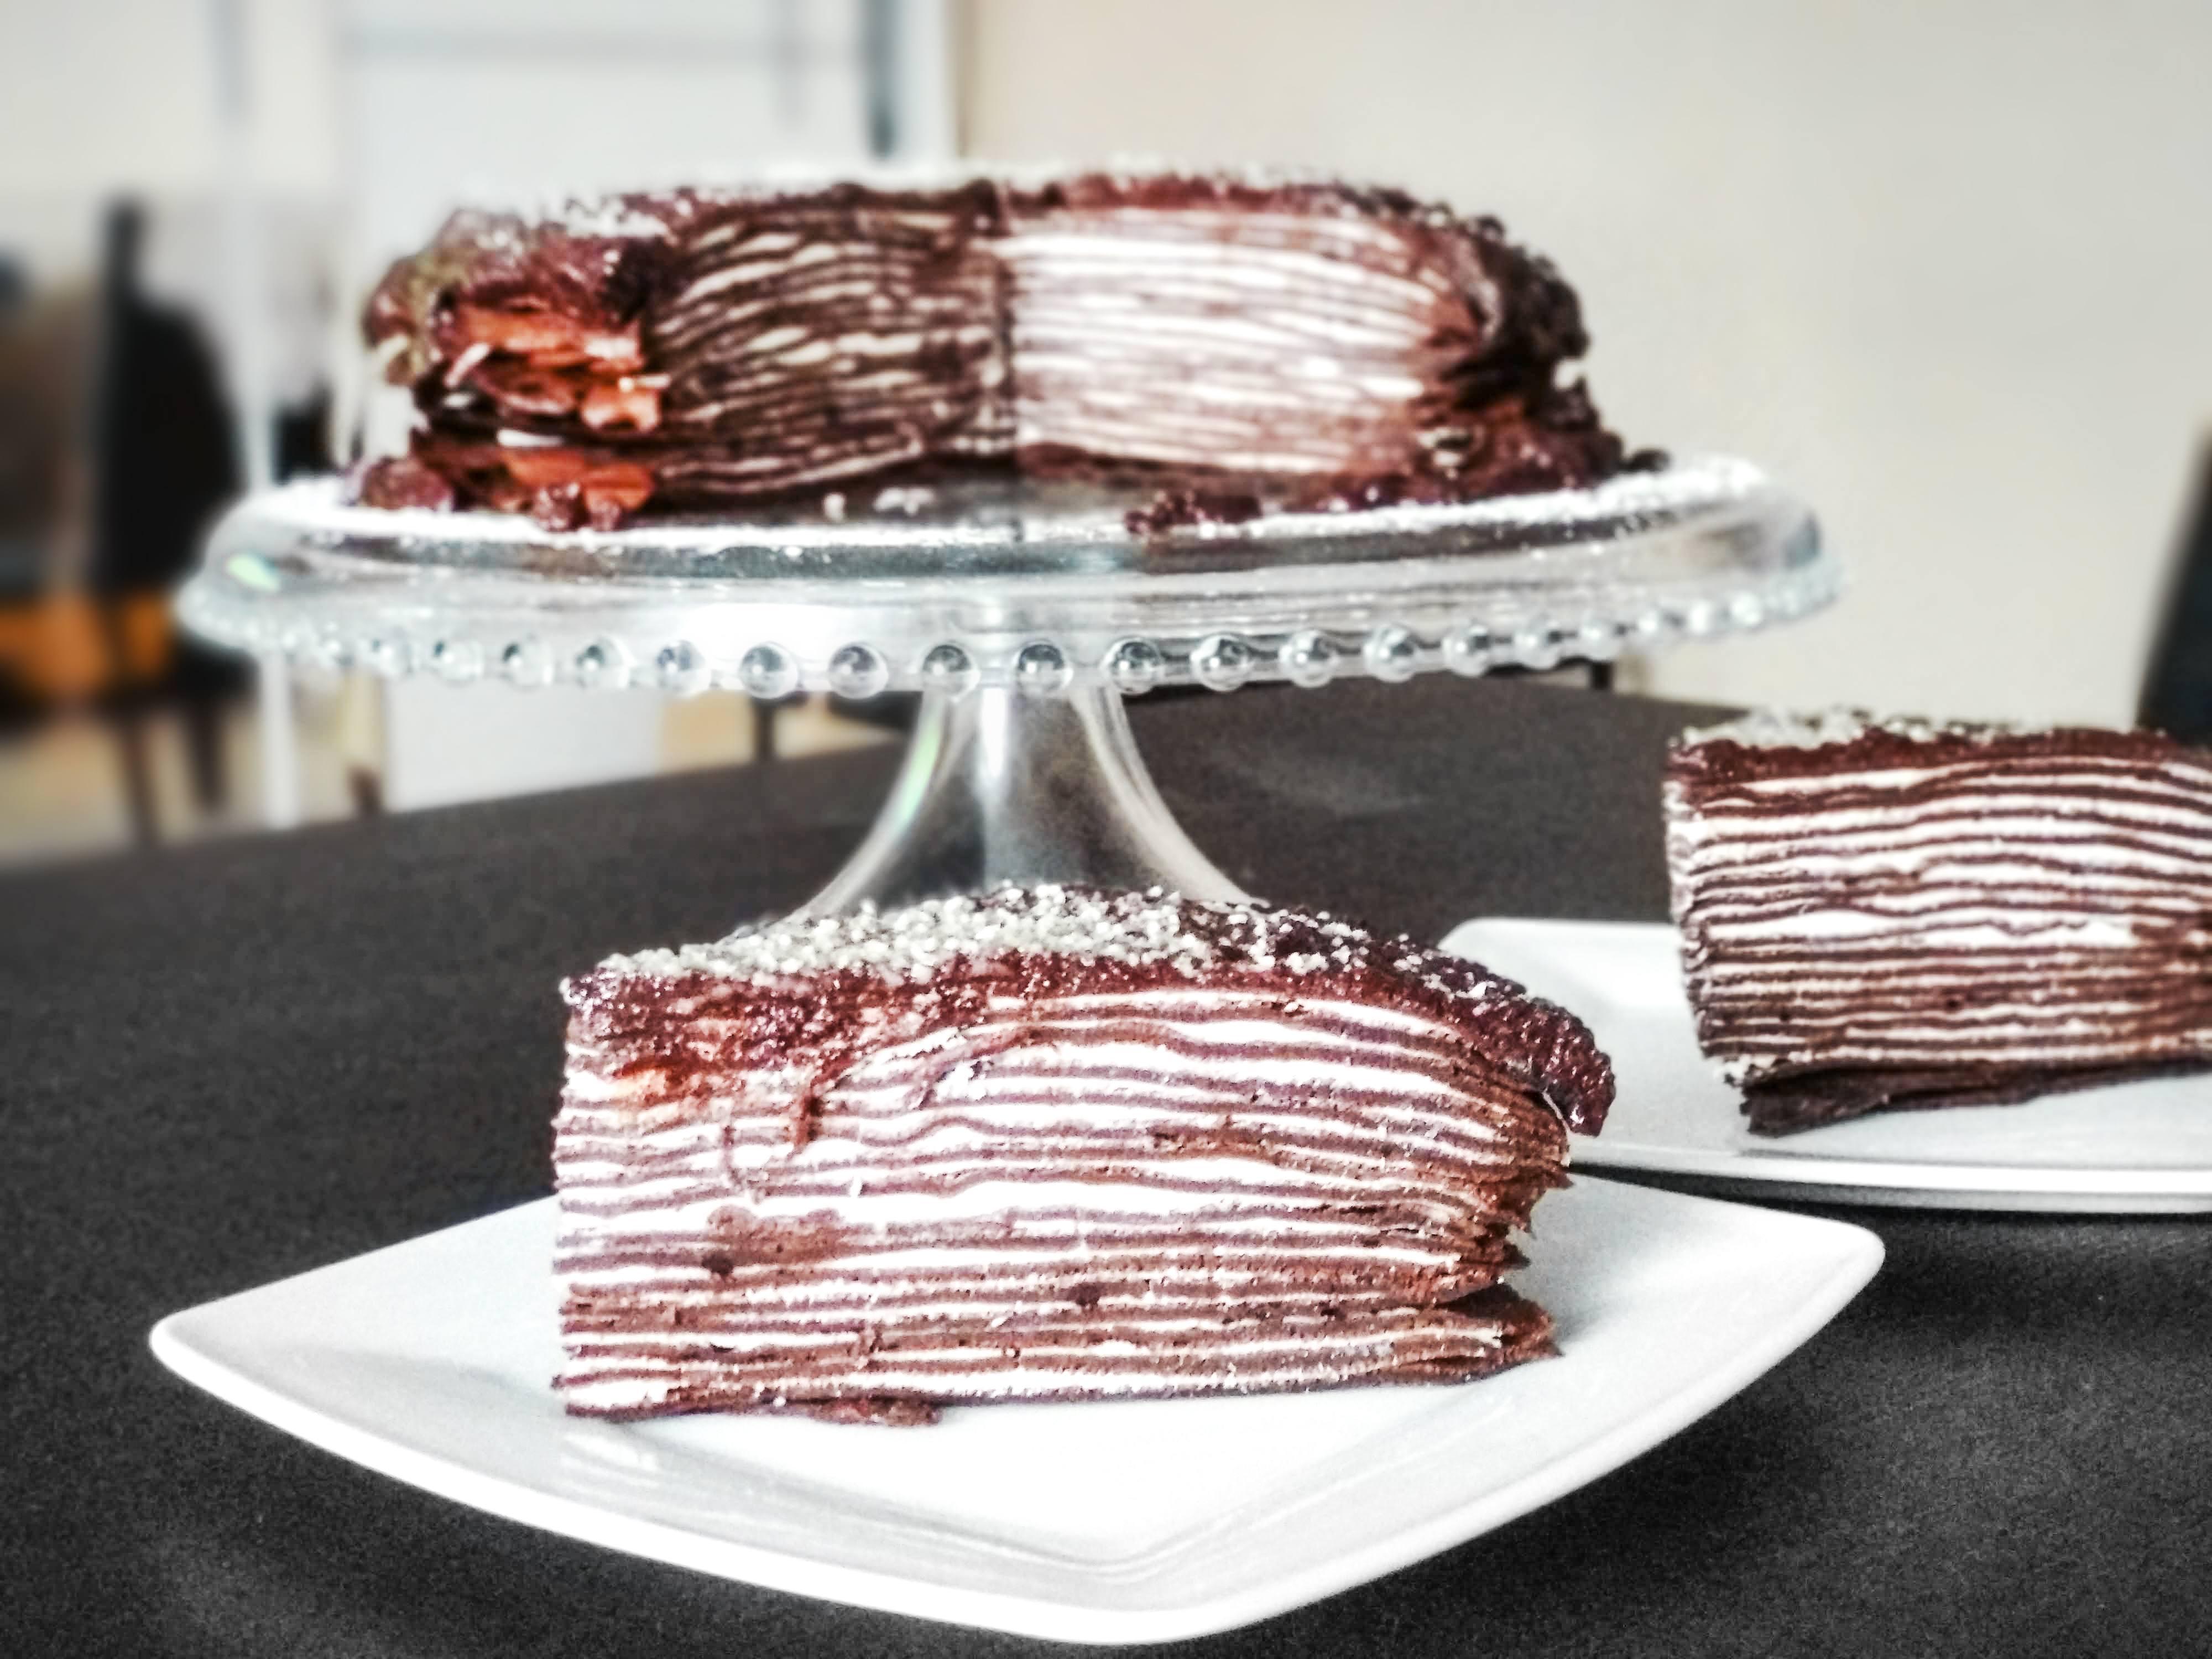 Receta de pastel de panqueques de chocolate